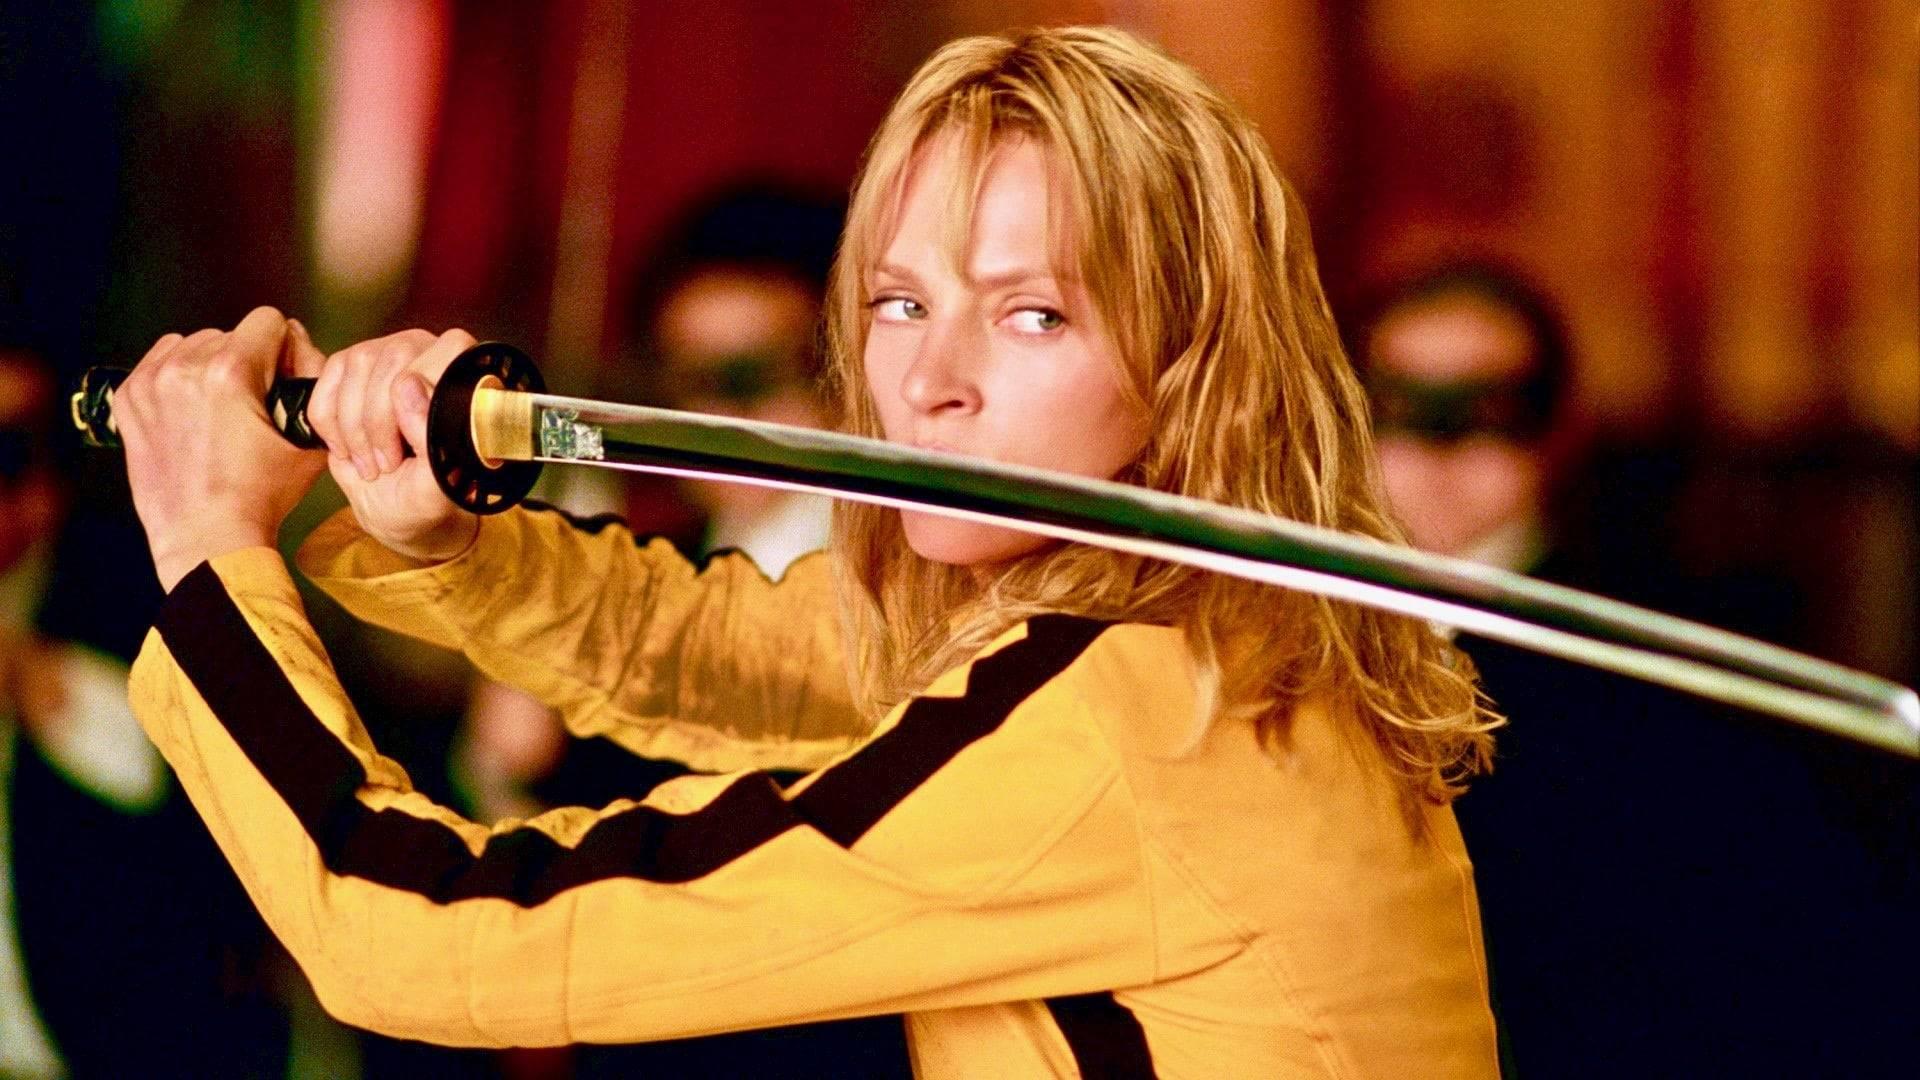 Kill Bill, Djando desencadenado y Pulp Fiction. Tres joyas de Tarantino.